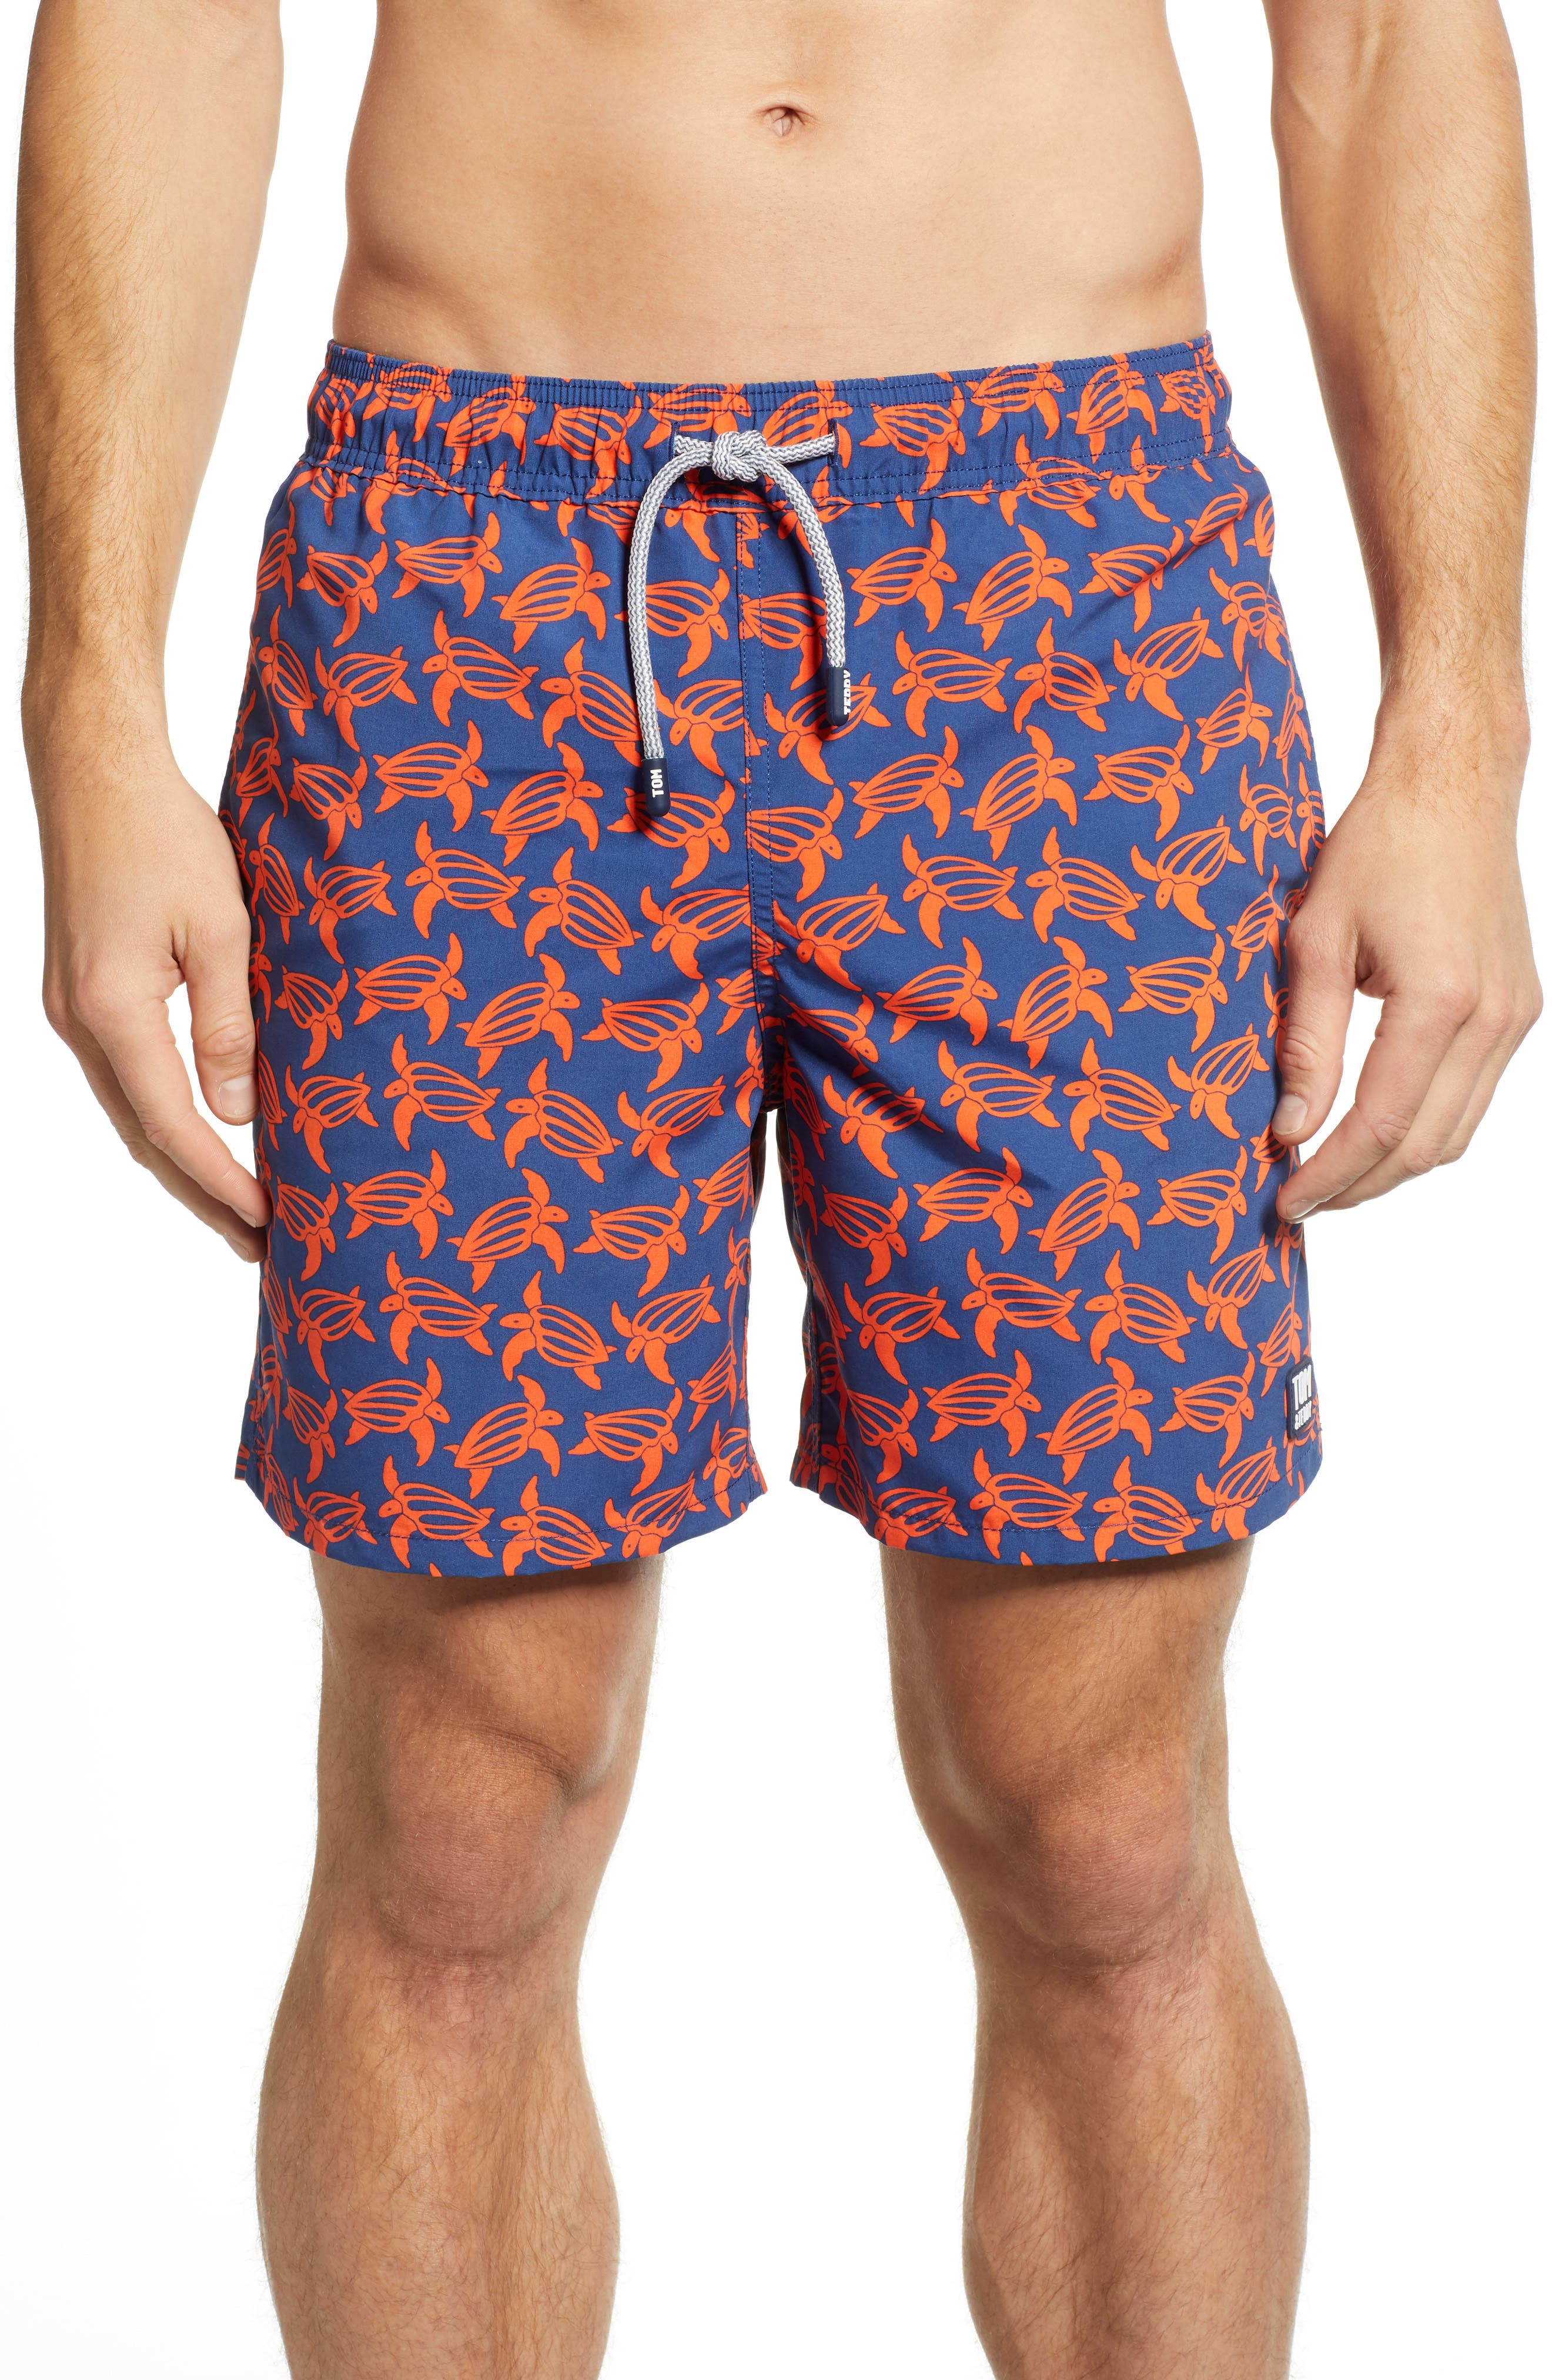 Turtle Print Swim Trunks,                         Main,                         color, NAVY/ ORANGE